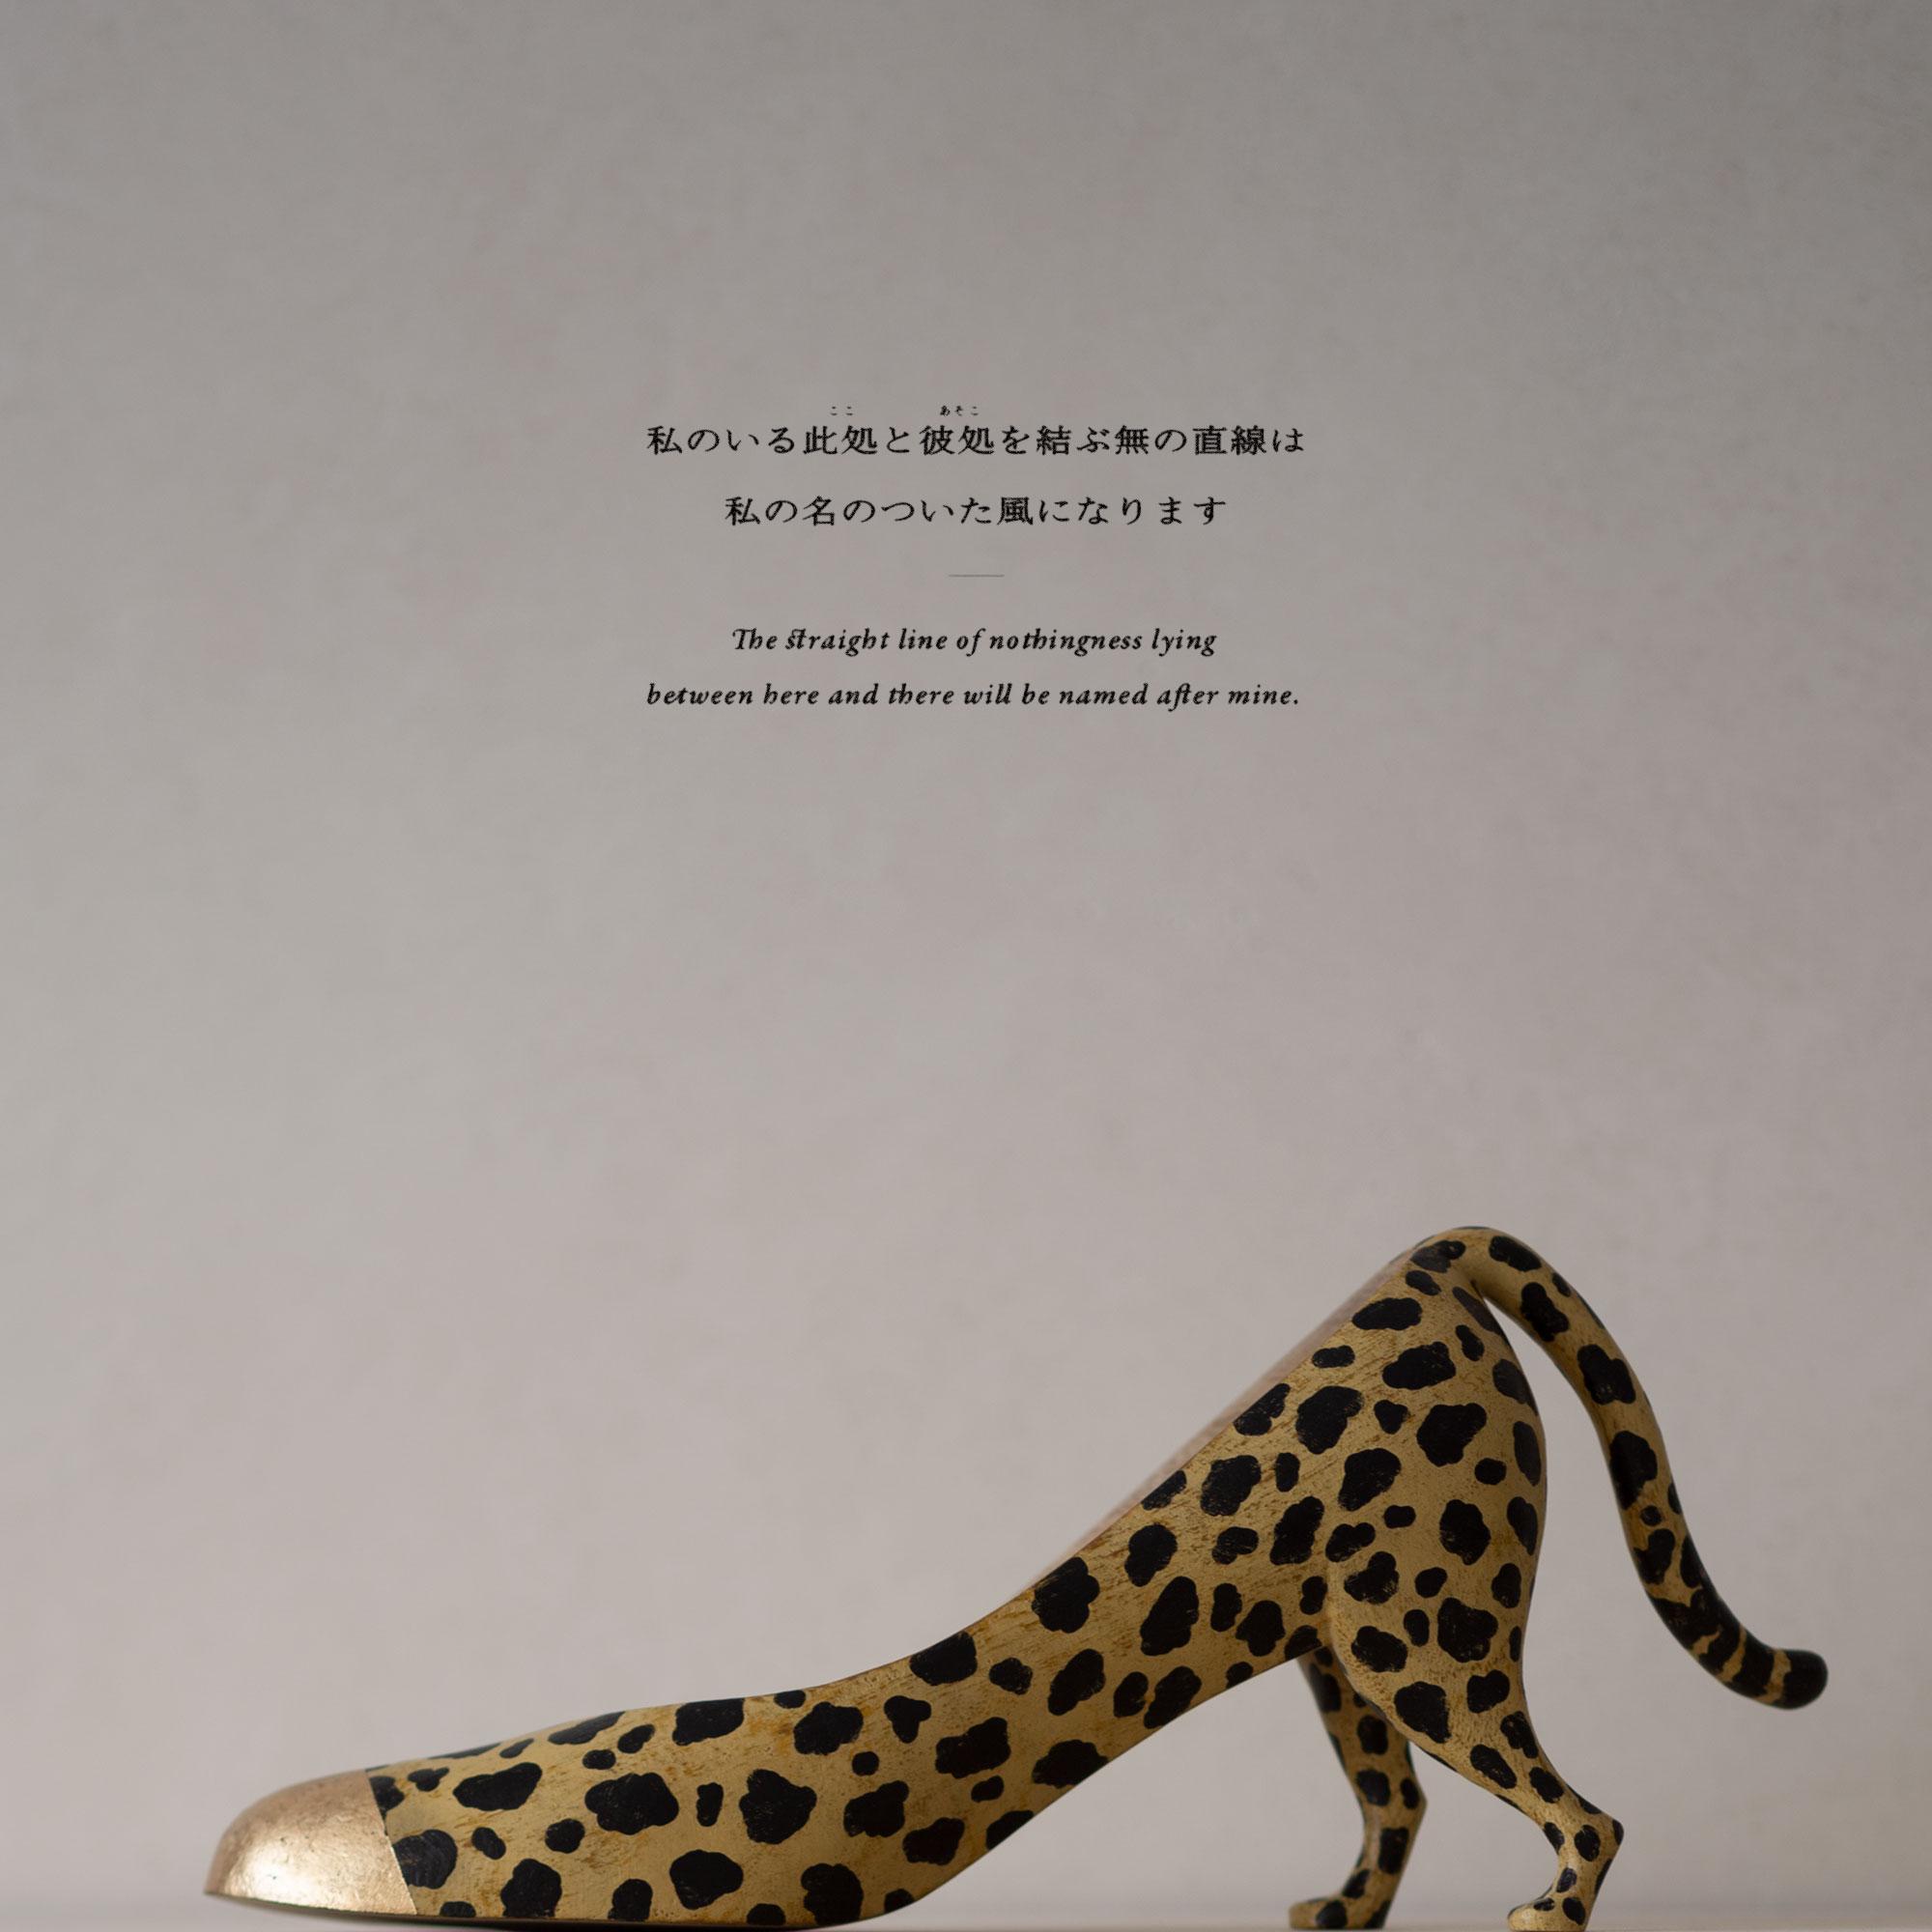 "Yuta NISHIURA ""Colours"" #03 Mar. 2020 「私のいる此処と彼処を結ぶ無の直線は 私の名のついた風になります」"